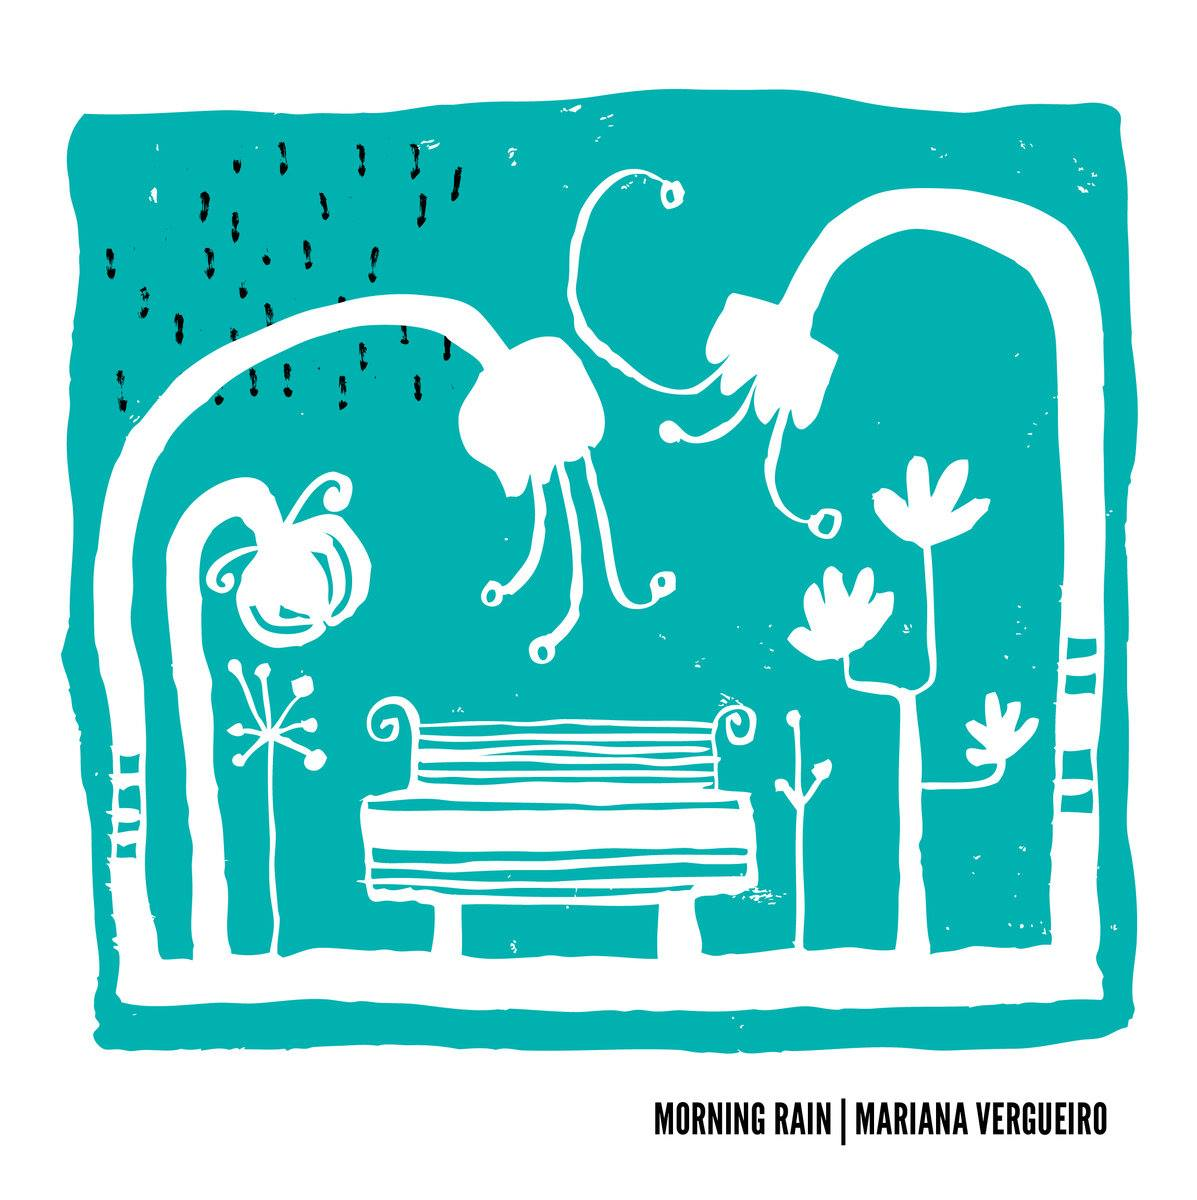 Mariana Vergueiro - Morning Rain